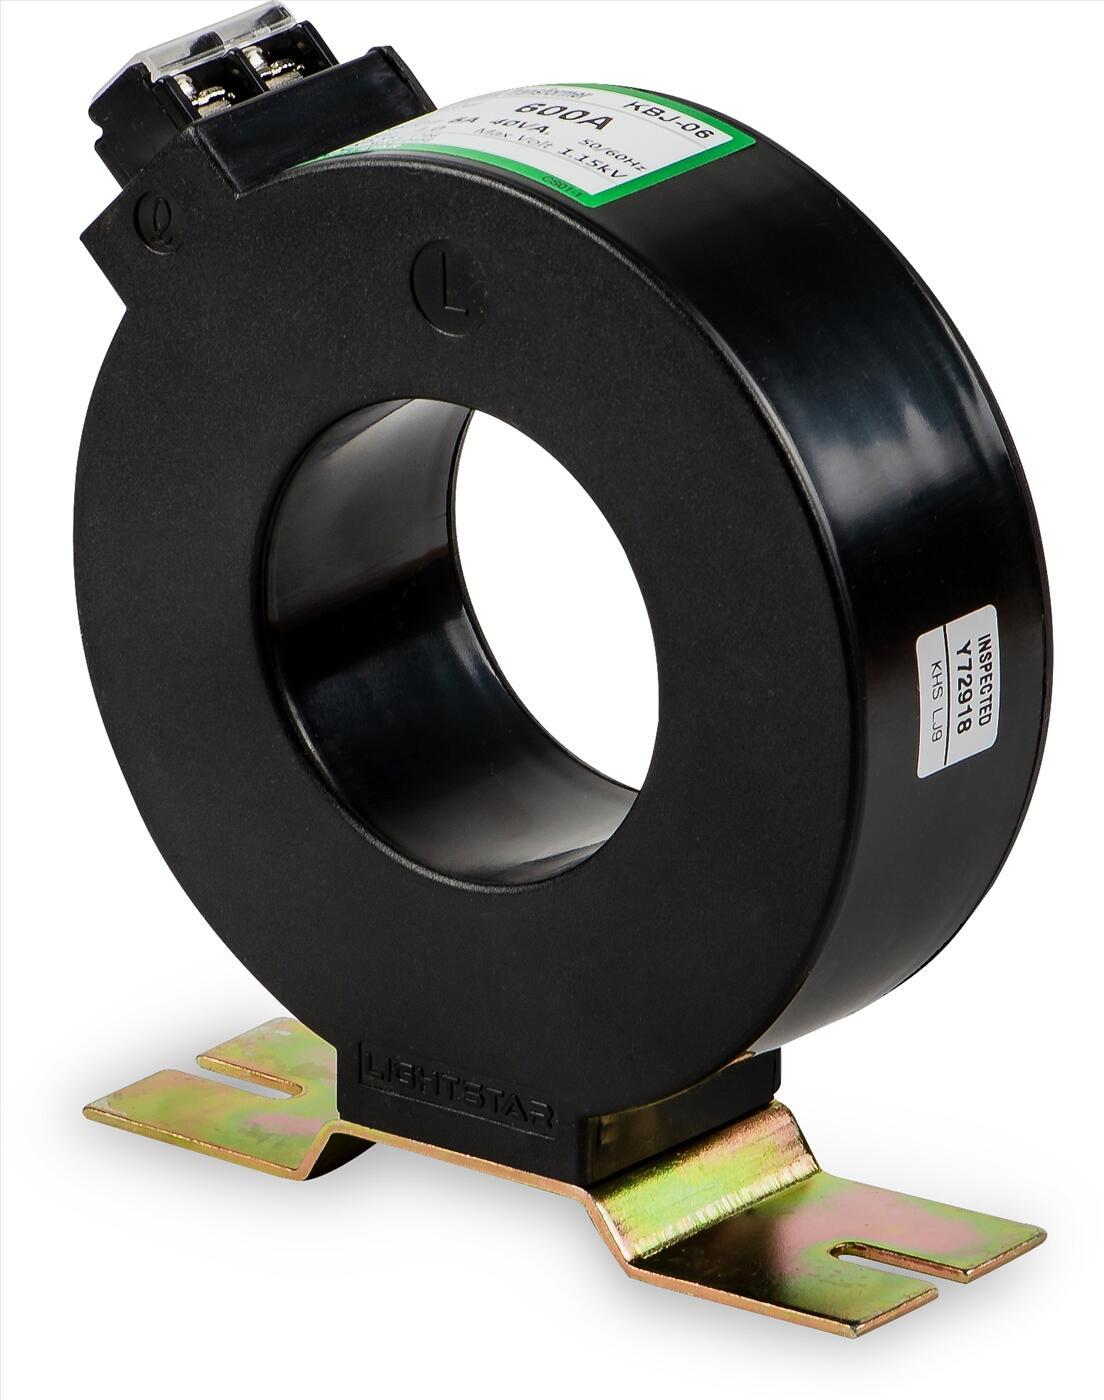 Biến dòng đo lường KBJ-06 (150/5A,200/5A,300/5A,400/5A,500/5A,600/5A)